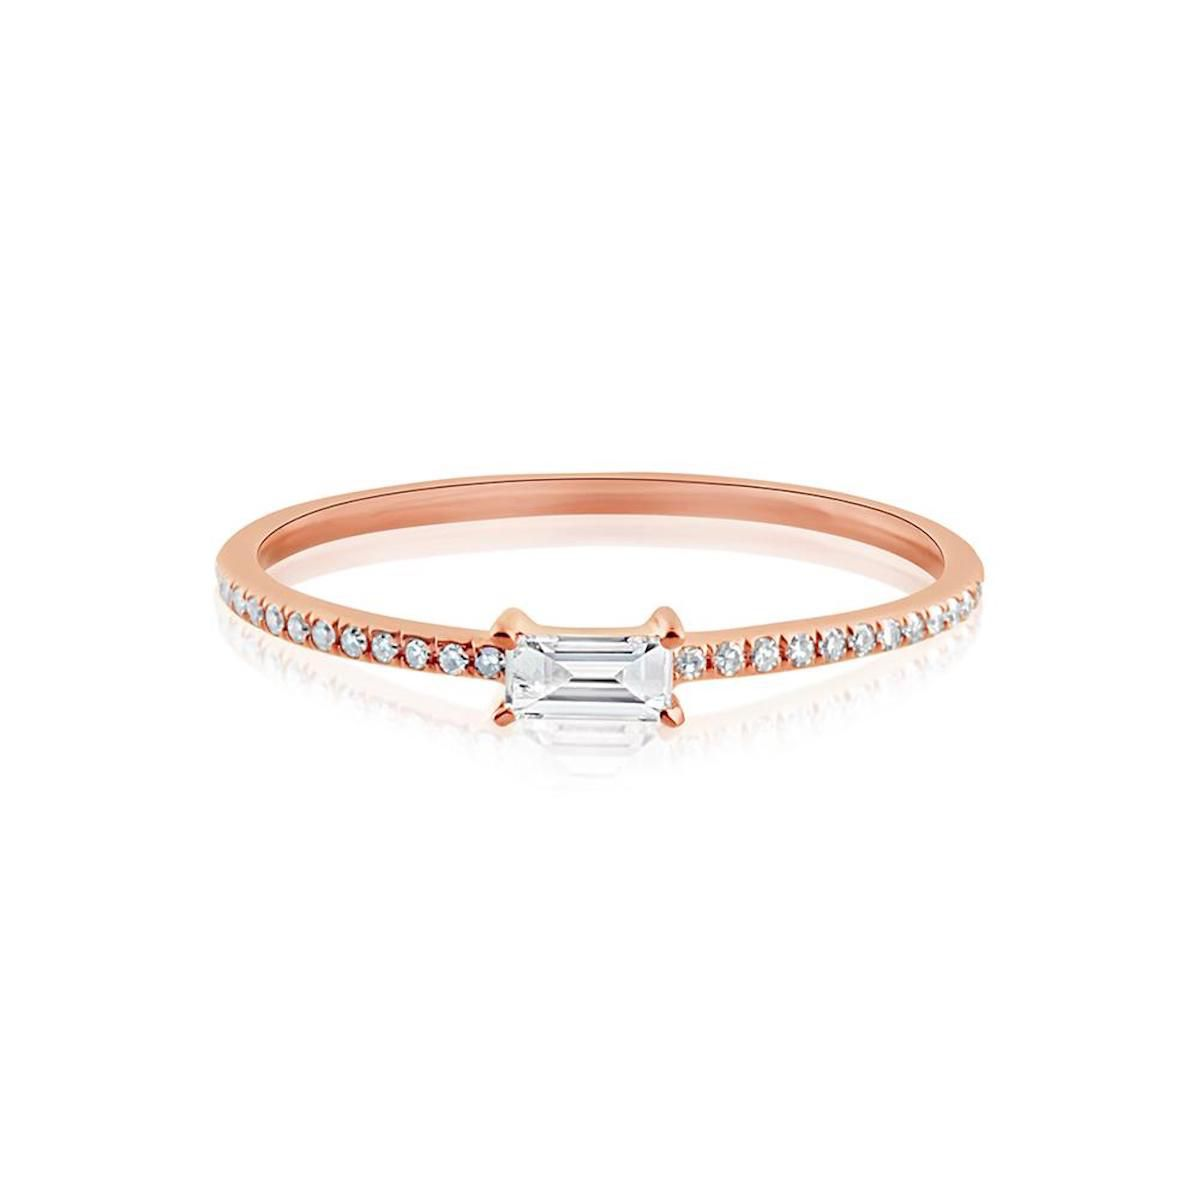 J. Luu Horizontal Baguette Diamond Ring